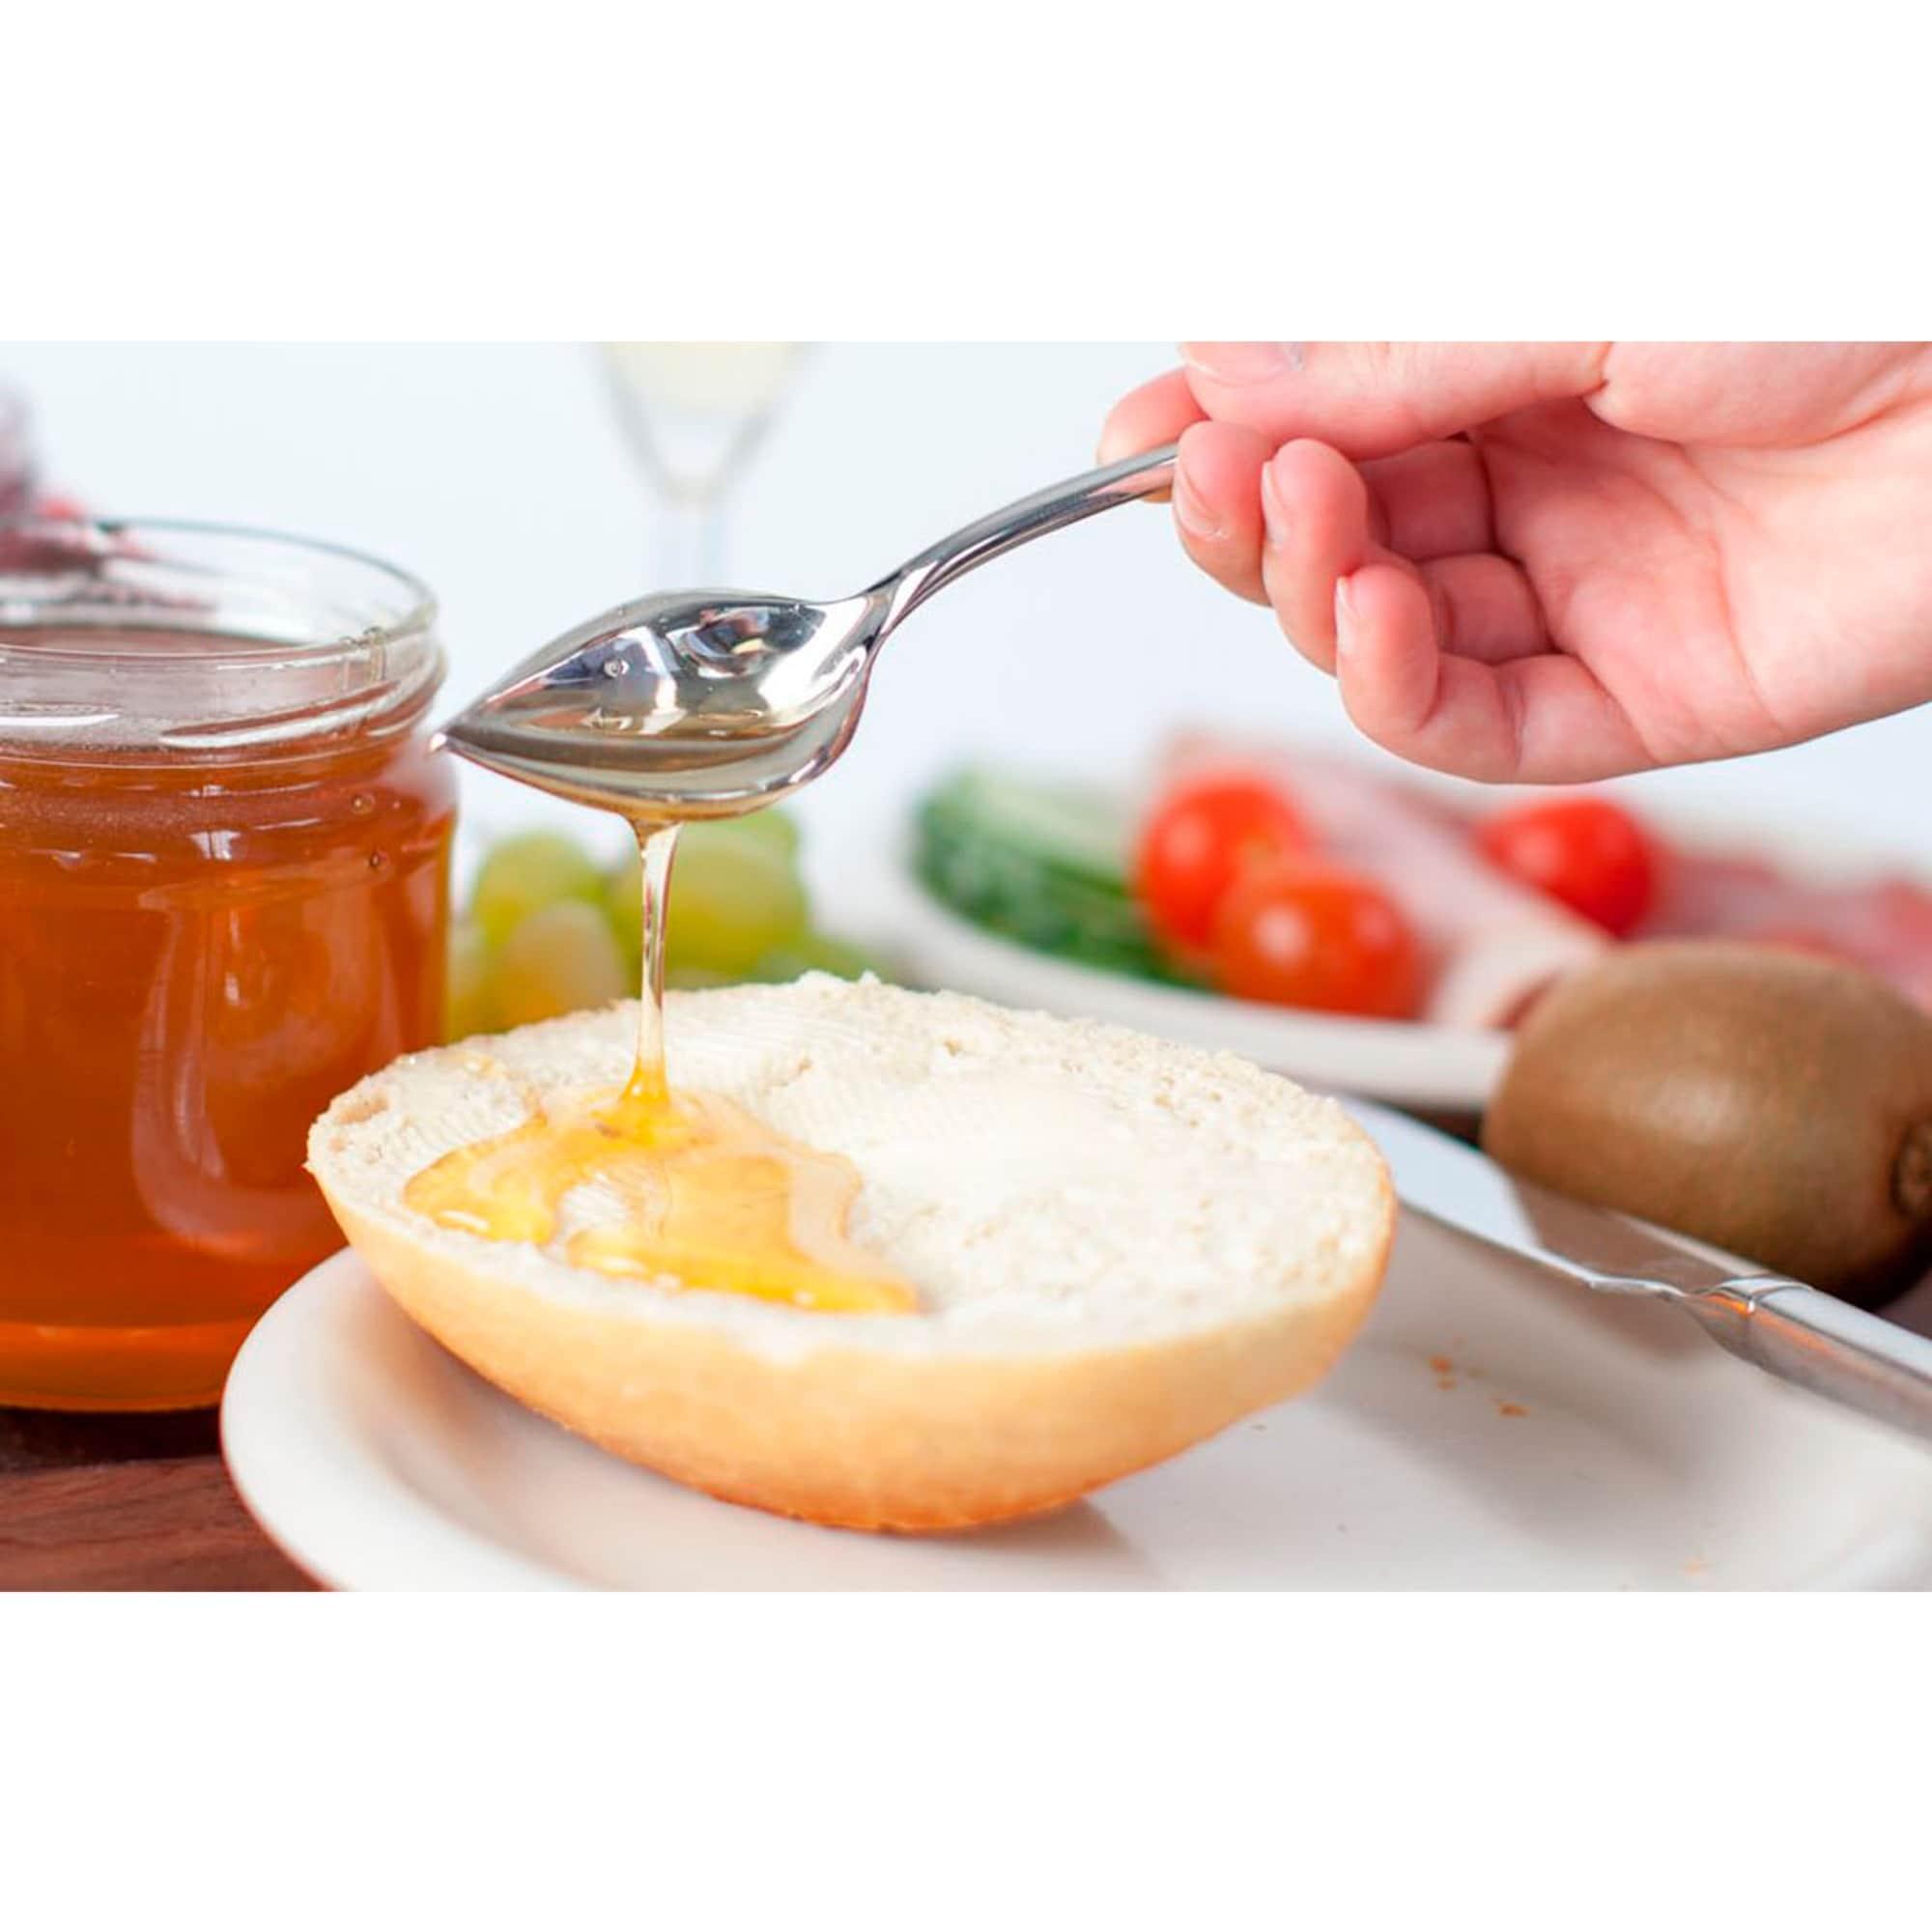 GHL Der Gourmet Honiglöffel